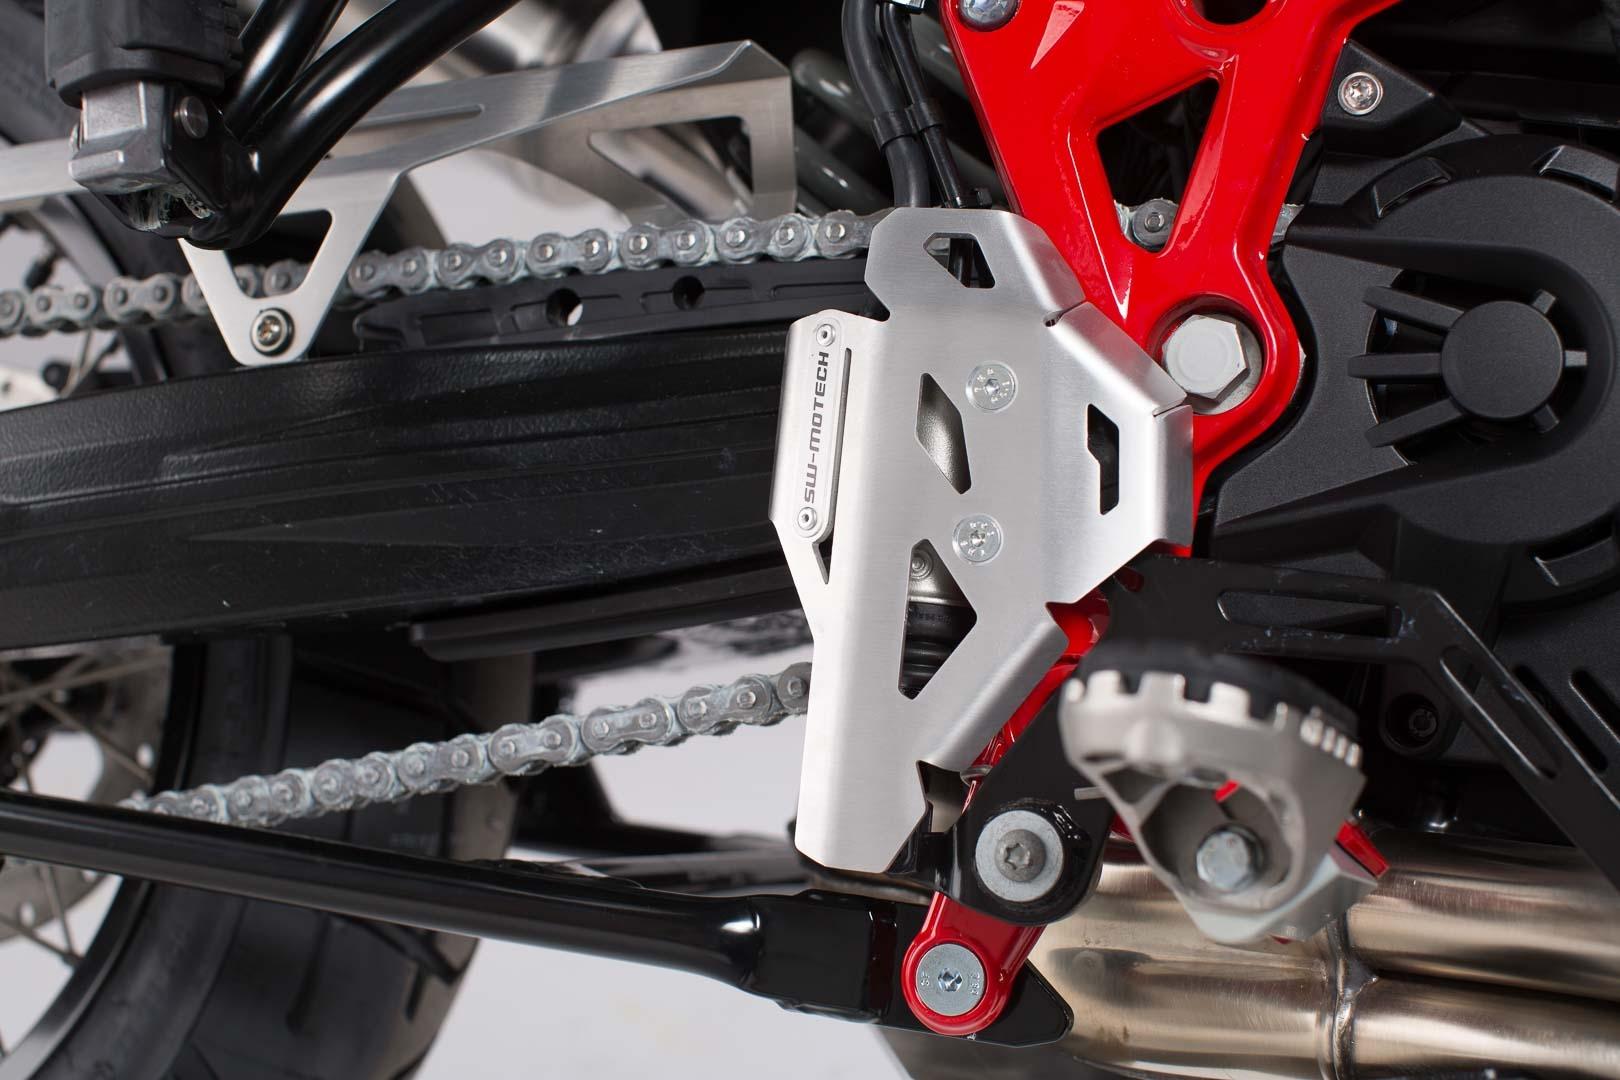 SW Motech brake cylinder guard, BMW F650GS, F700GS, F800GS & F800GSA